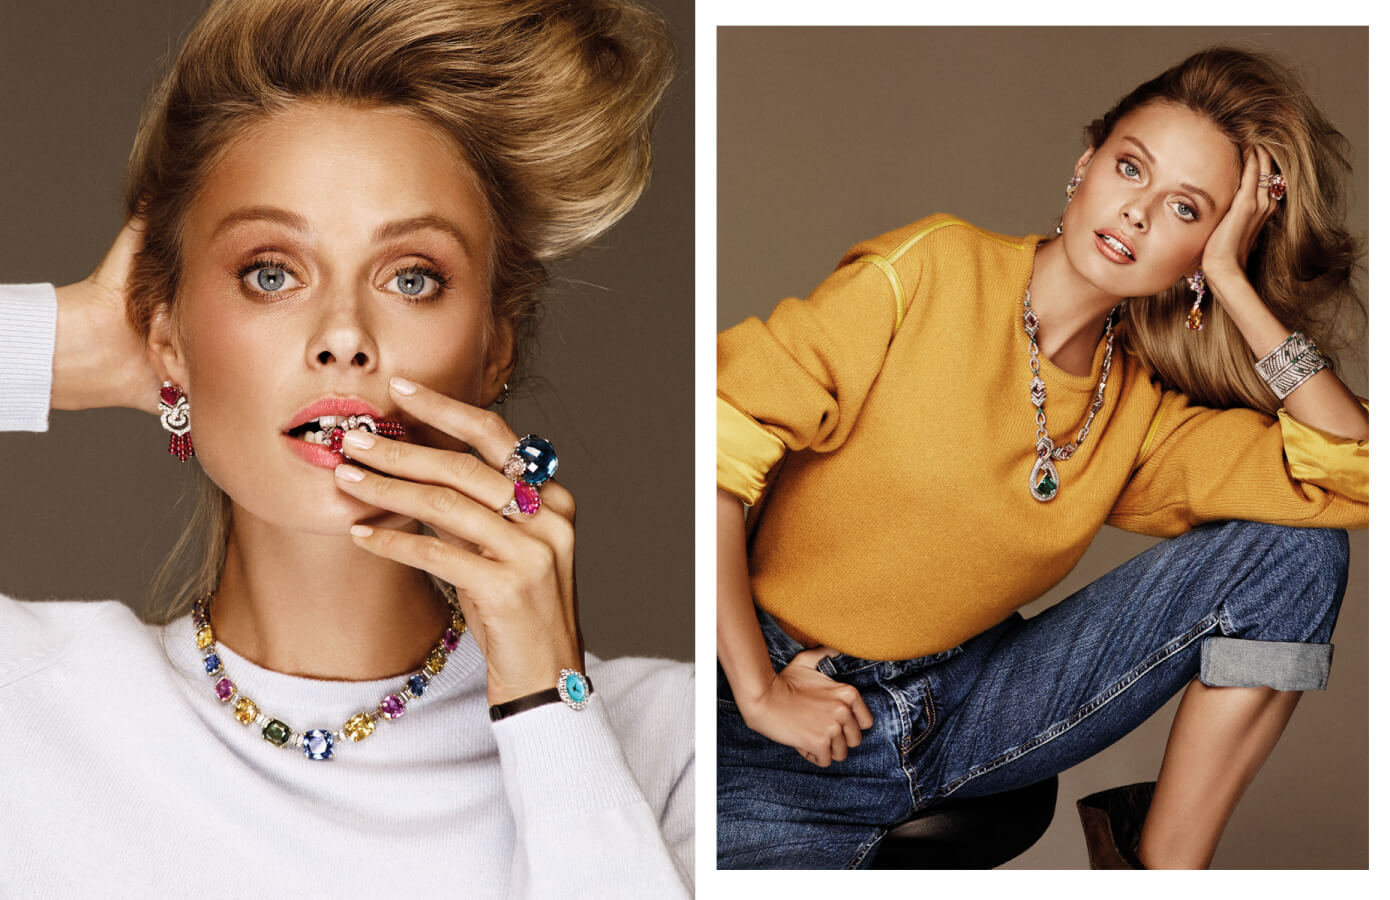 02_Alvaro_Beamud_Cortes_Vogue_Spain_Inguna_Butane